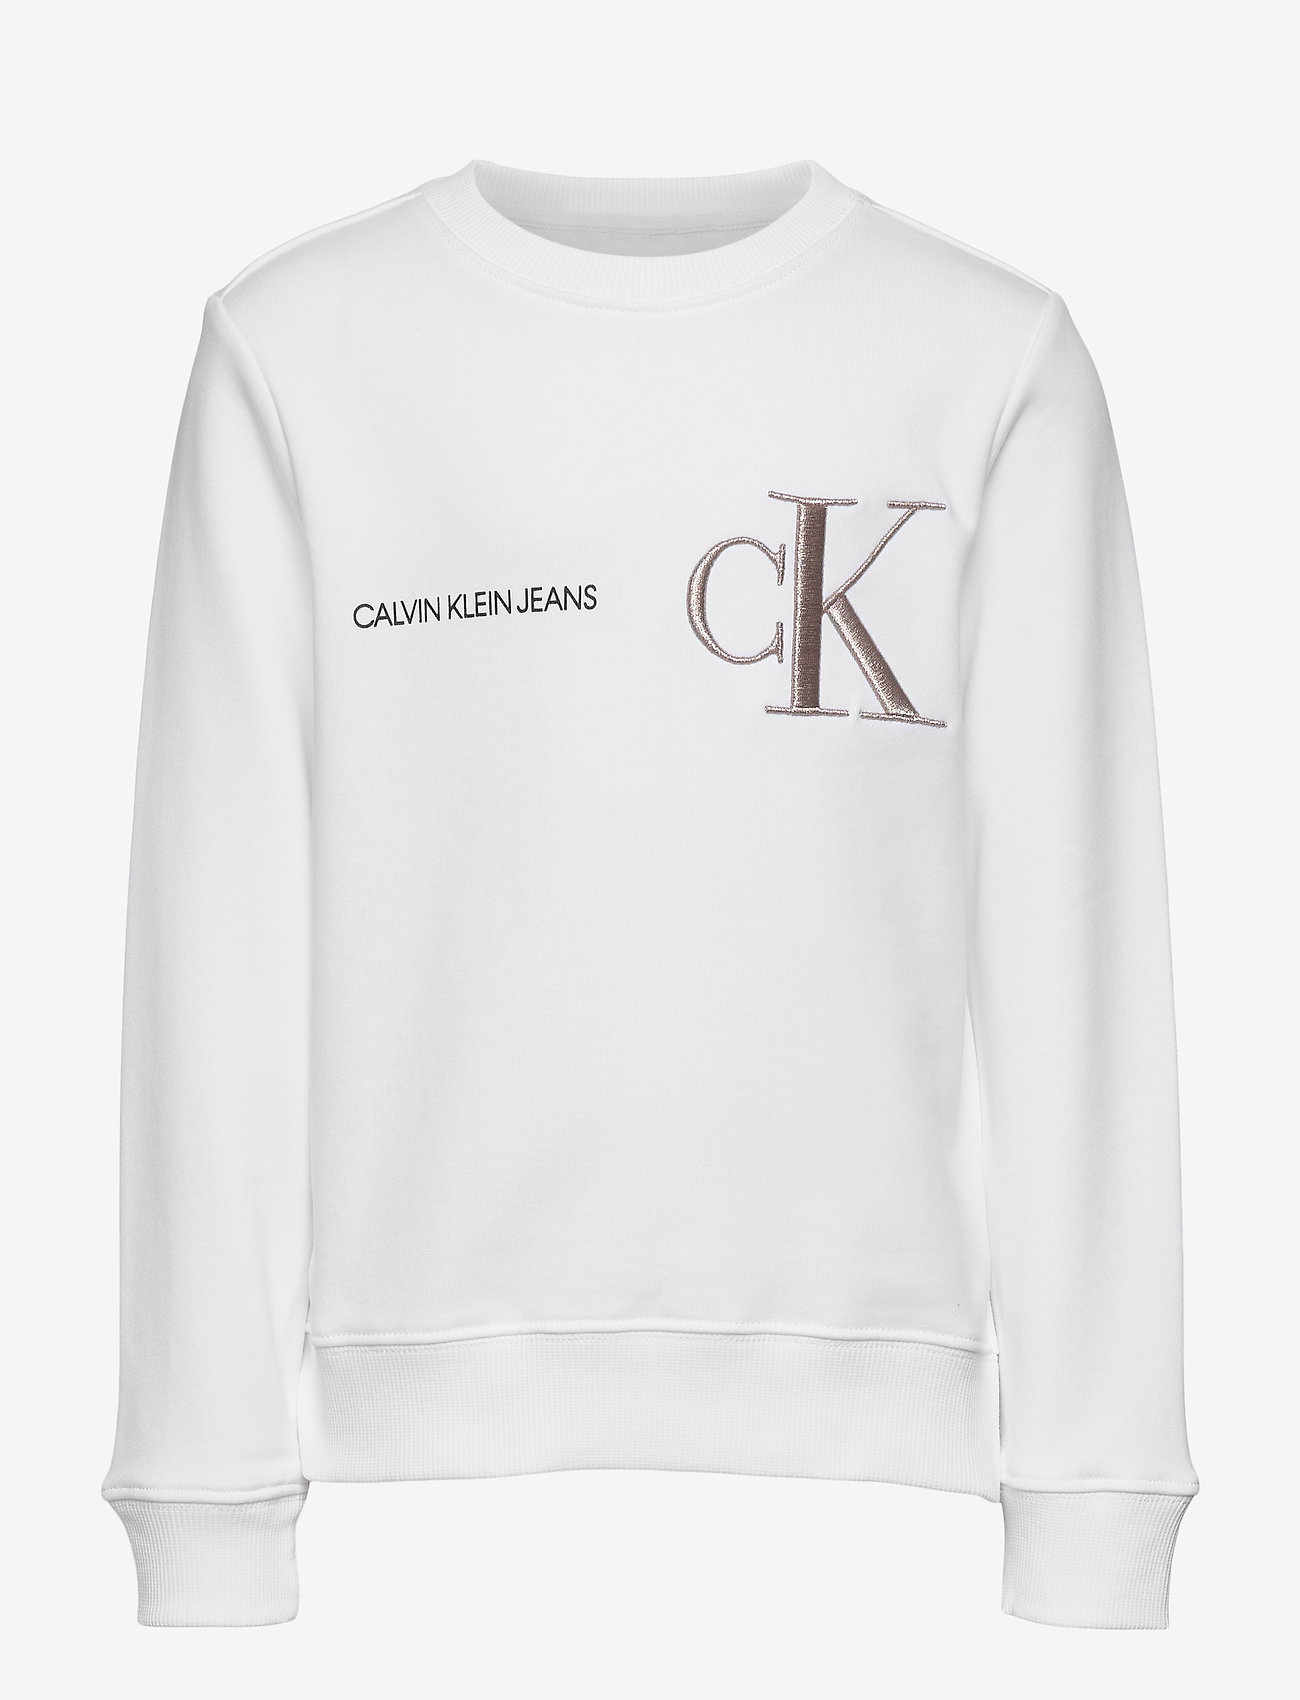 Calvin Klein - RAISED MONOGRAM SWEATSHIRT - sweatshirts - bright white - 0